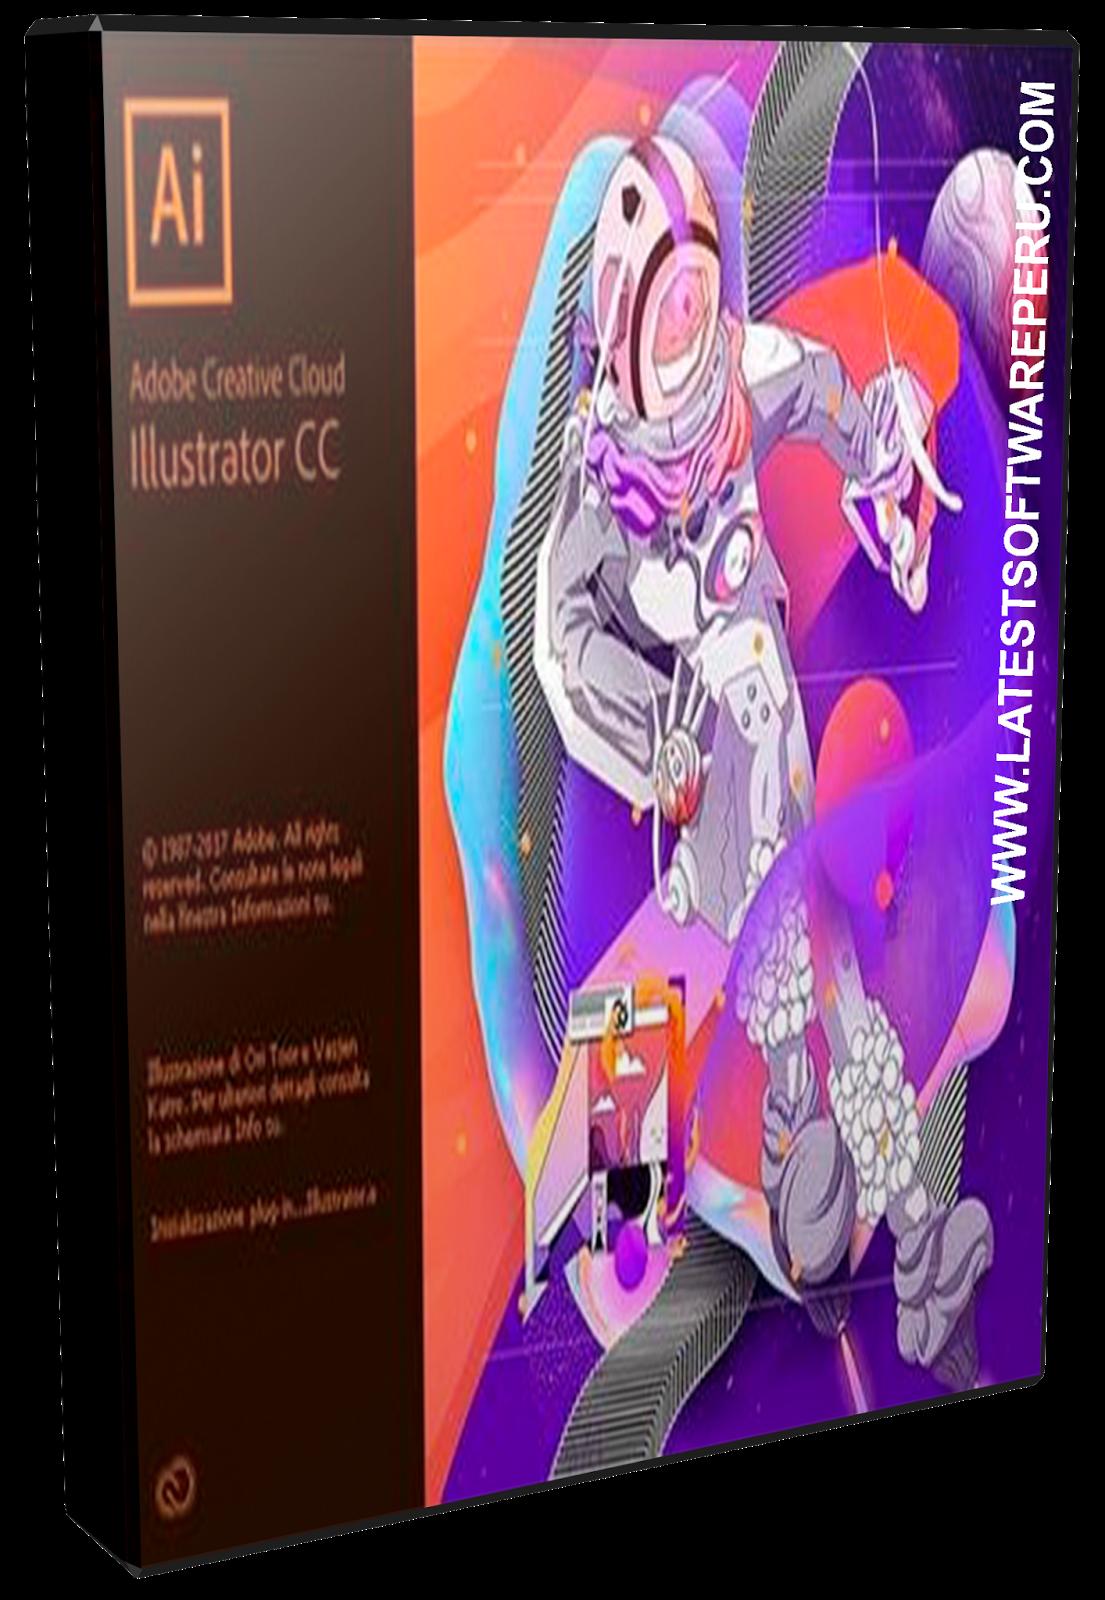 ADOBE ILLUSTRATOR CC 2018 22.0.0.243 (MAC OS X), MULTILENGUAJE CREAR ...